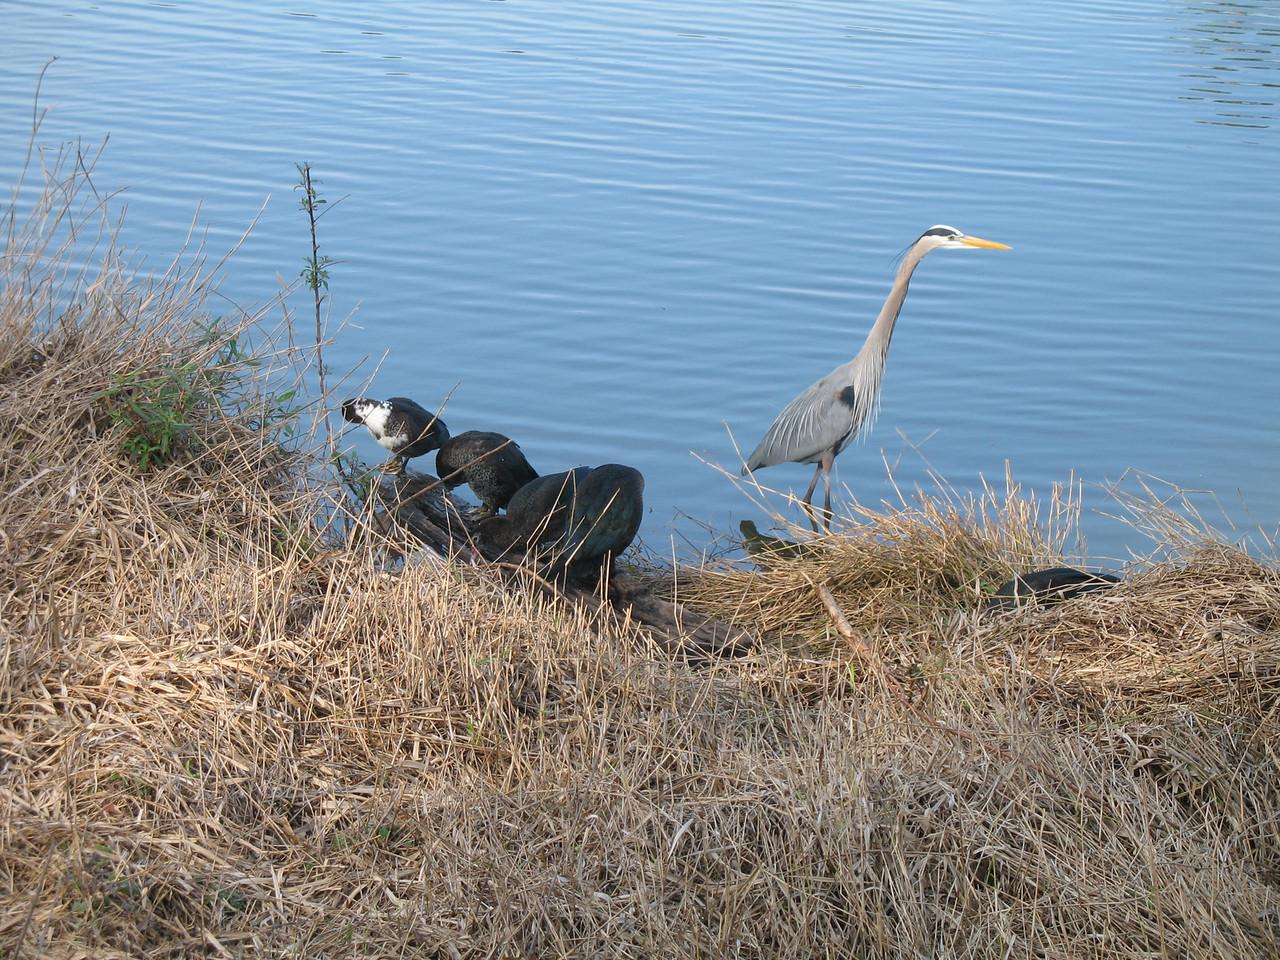 Birds at Lake Lillian, downtown Belleview<br /> PHOTO CREDIT: Florida Trail Association / Sandra Friend